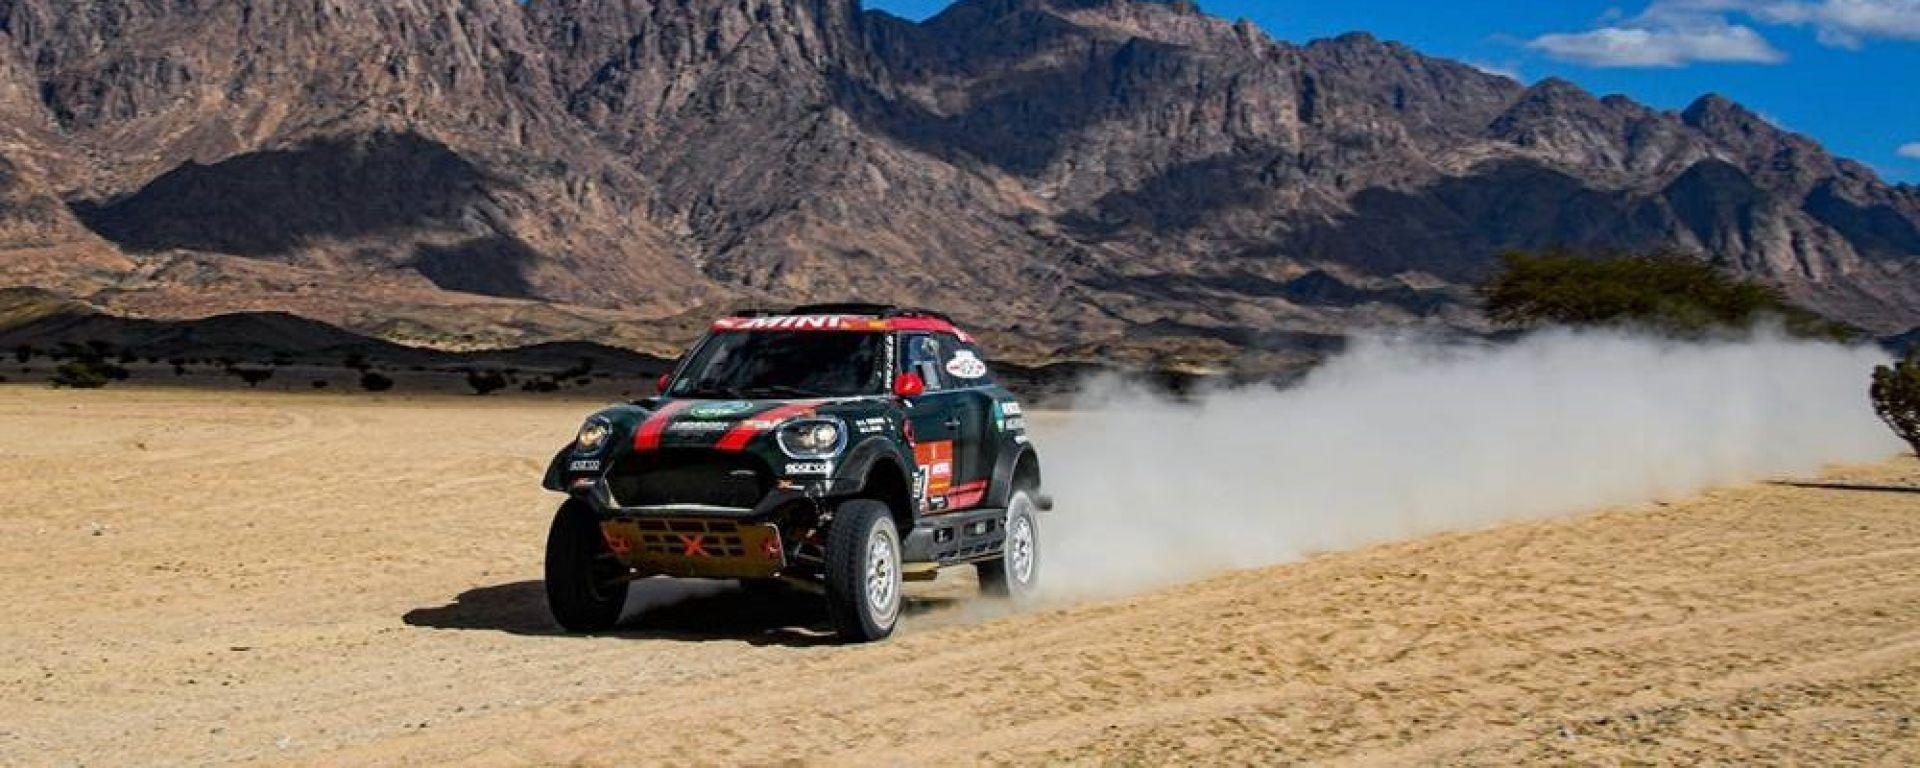 Dakar 2020: Orlando Terranova (Mini)